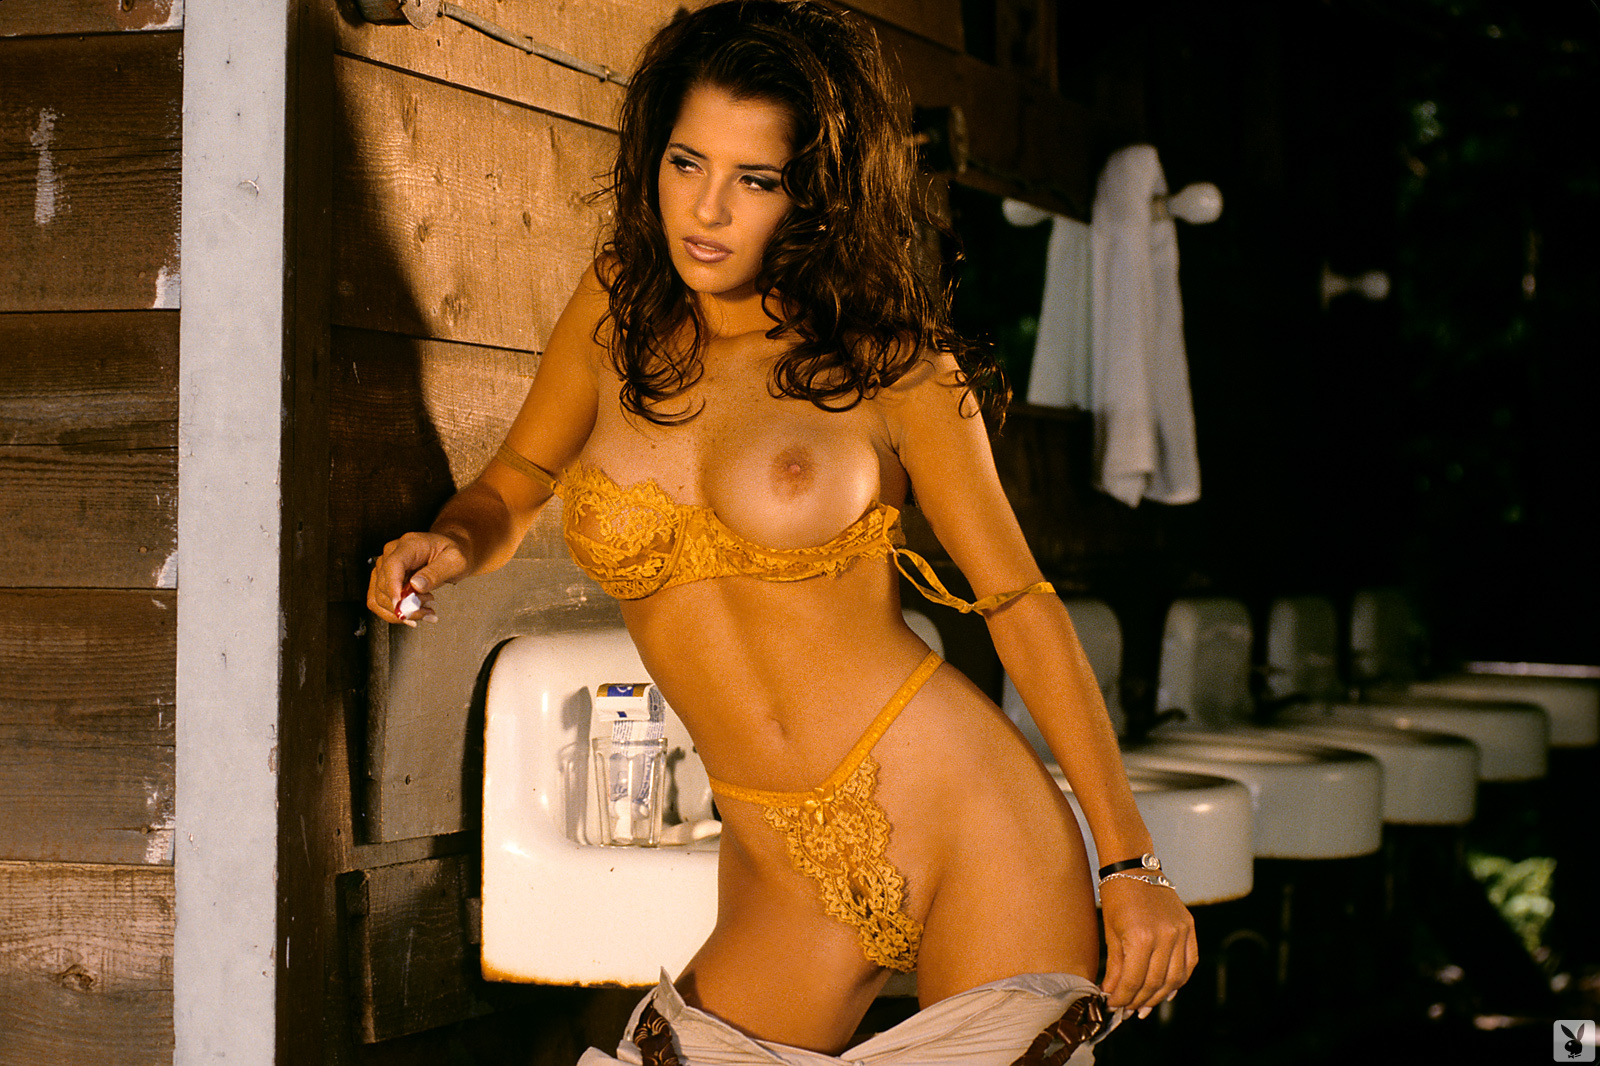 kelly-monaco-boobs-naked-playmate-april-1997-playboy-21